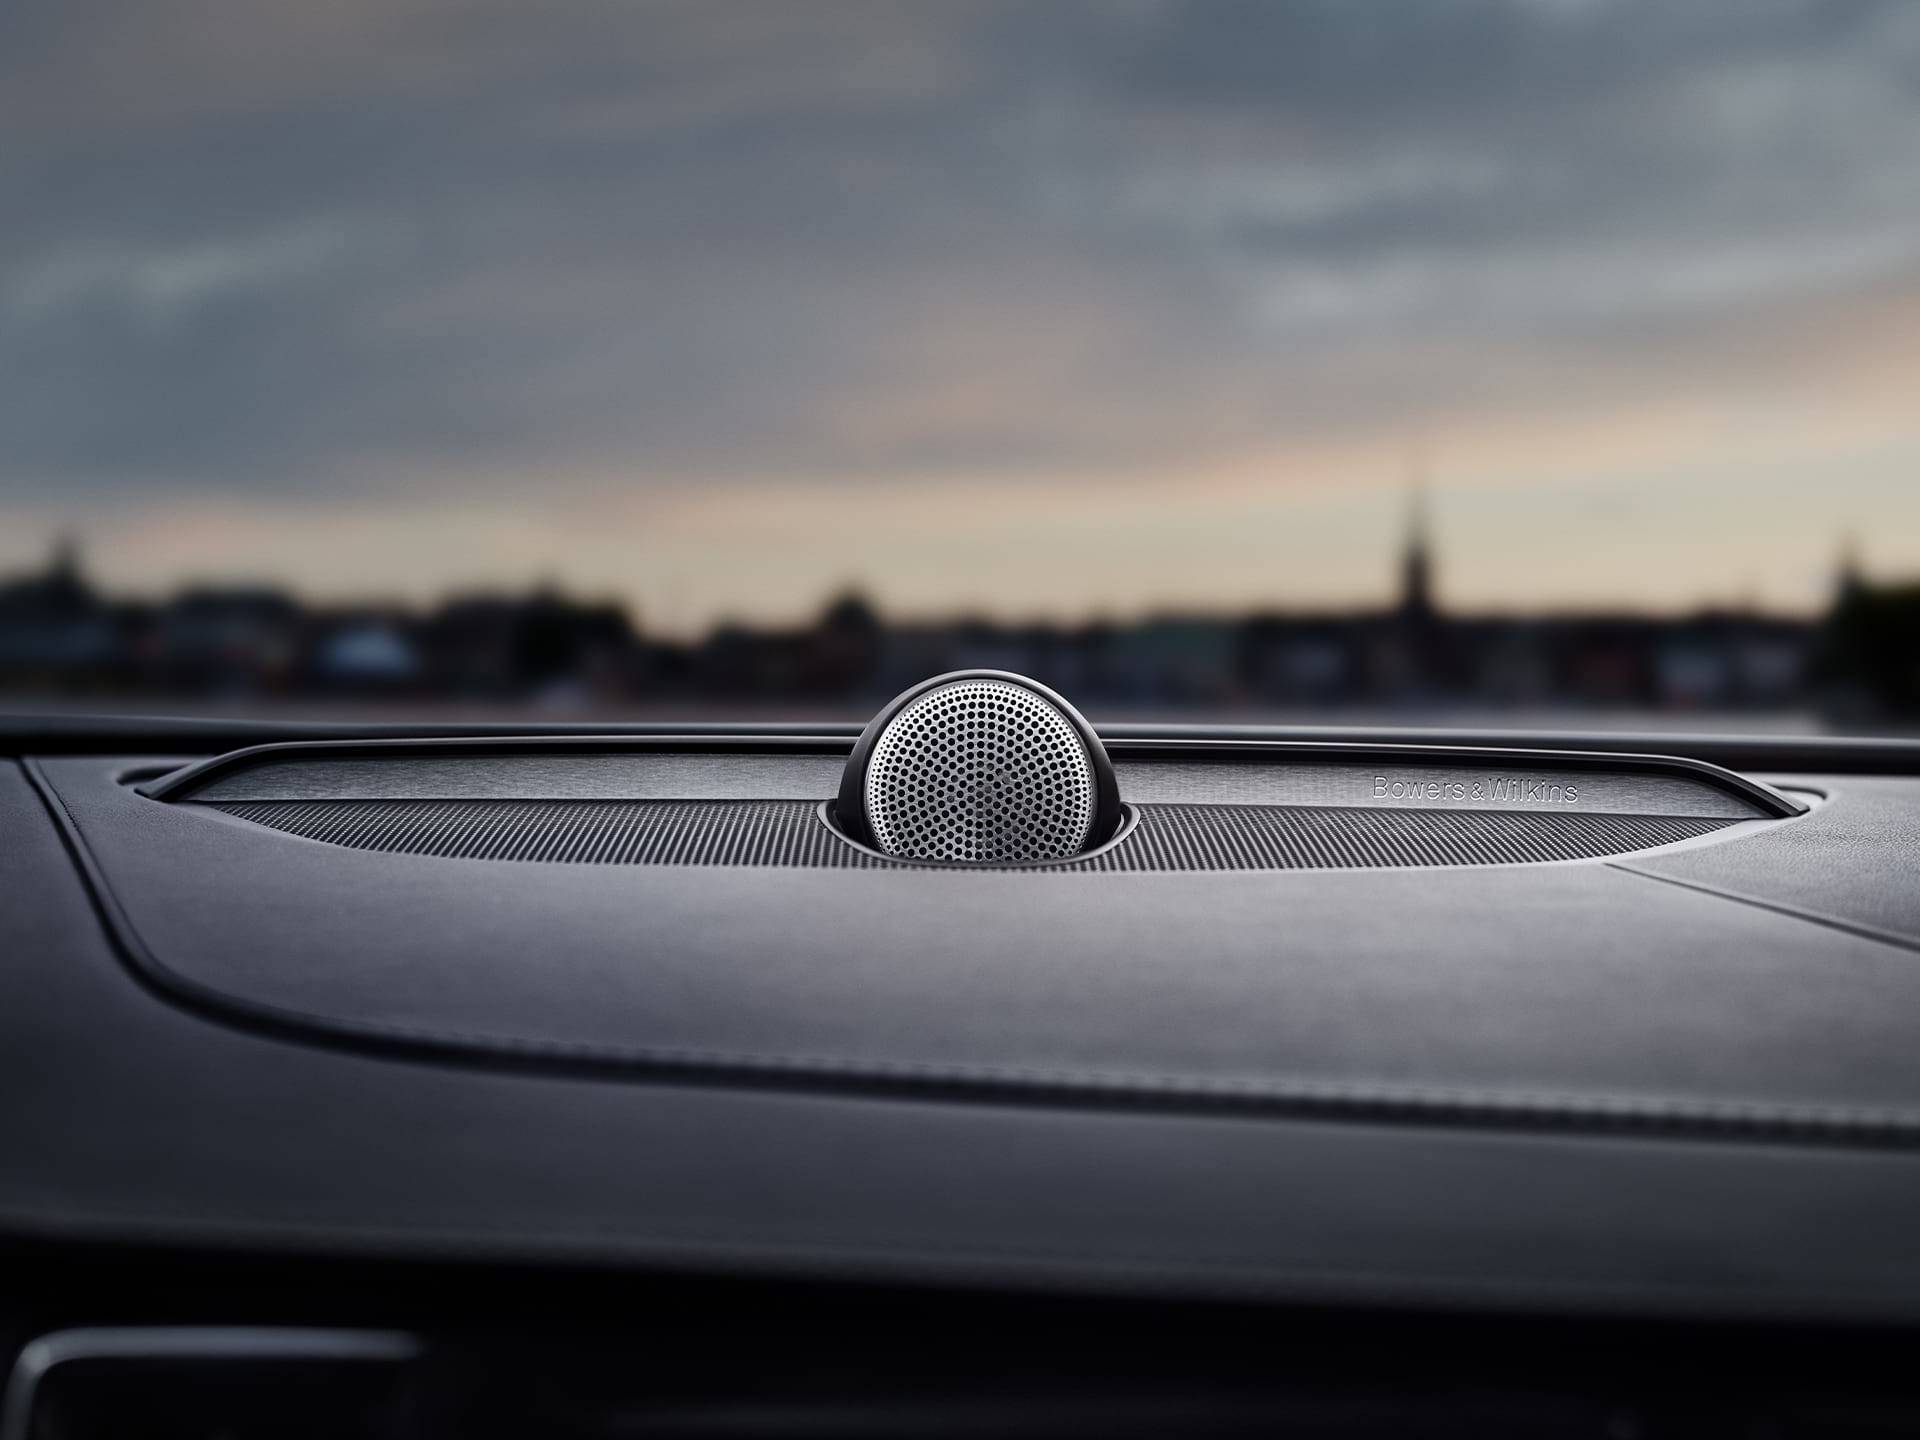 Bowers & Wilkins speakers inside a Volvo V90.